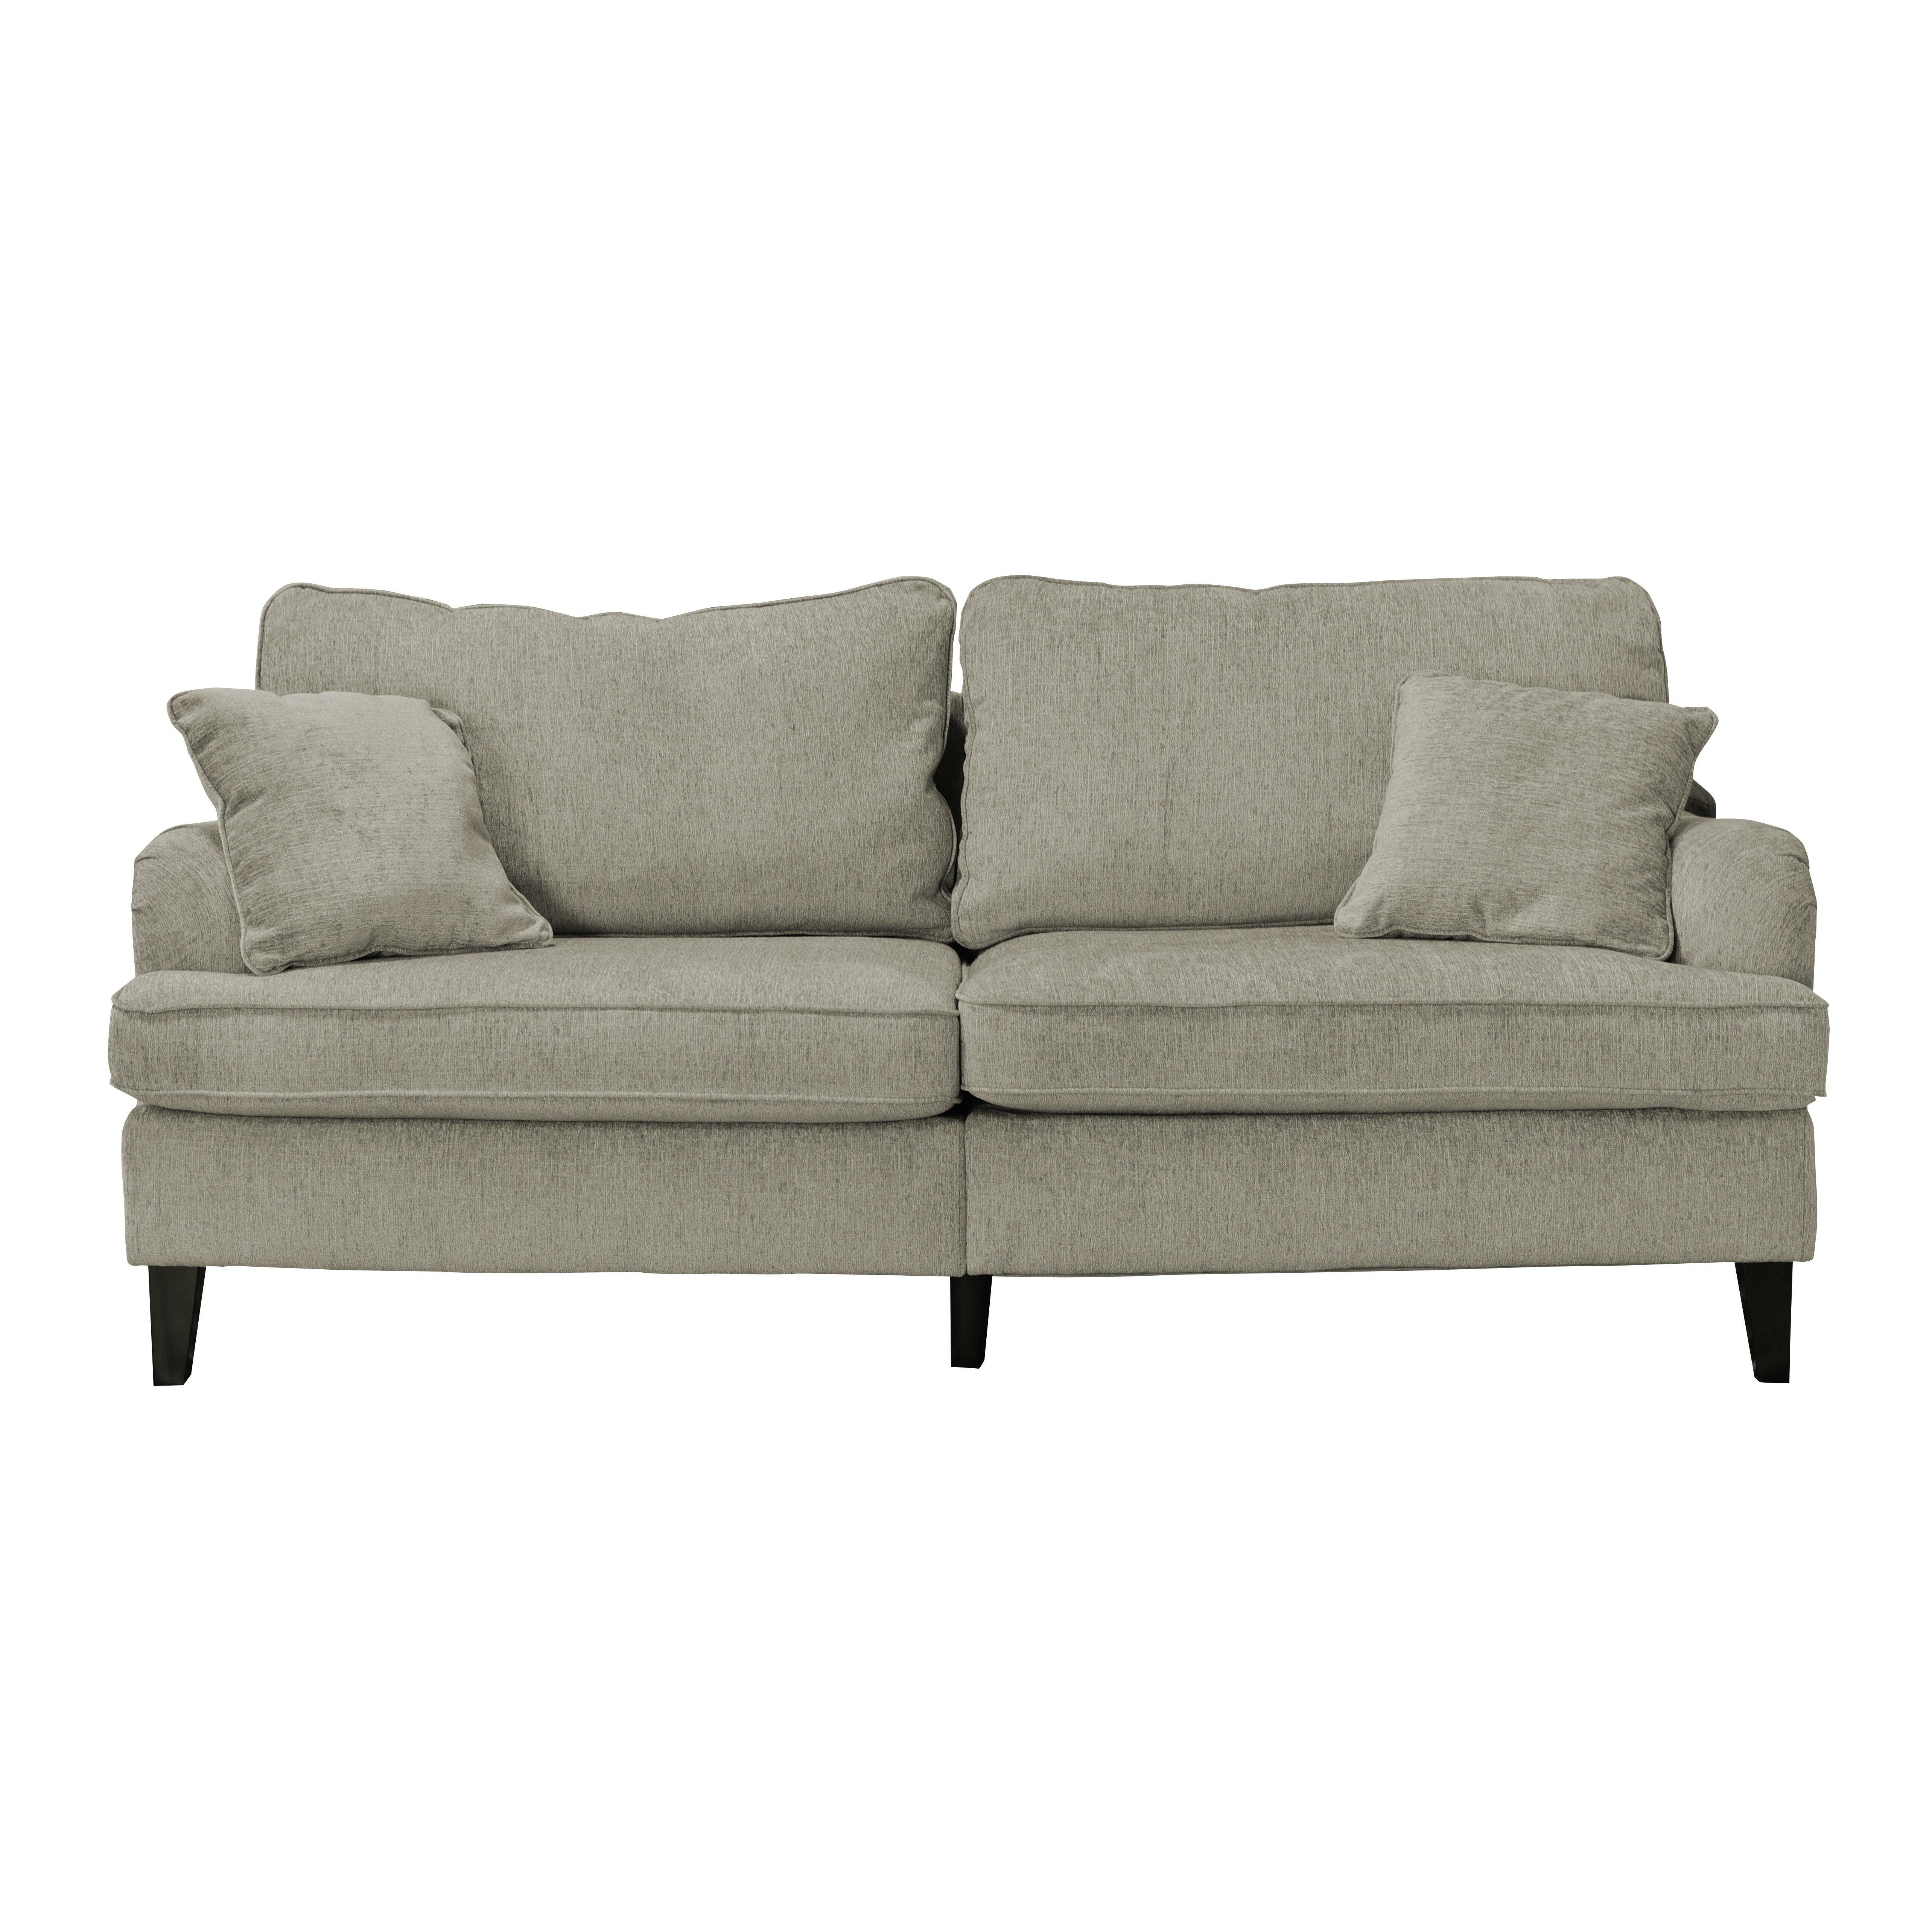 Serta At Home Carlisle 85 Sofa With Pleated Arms